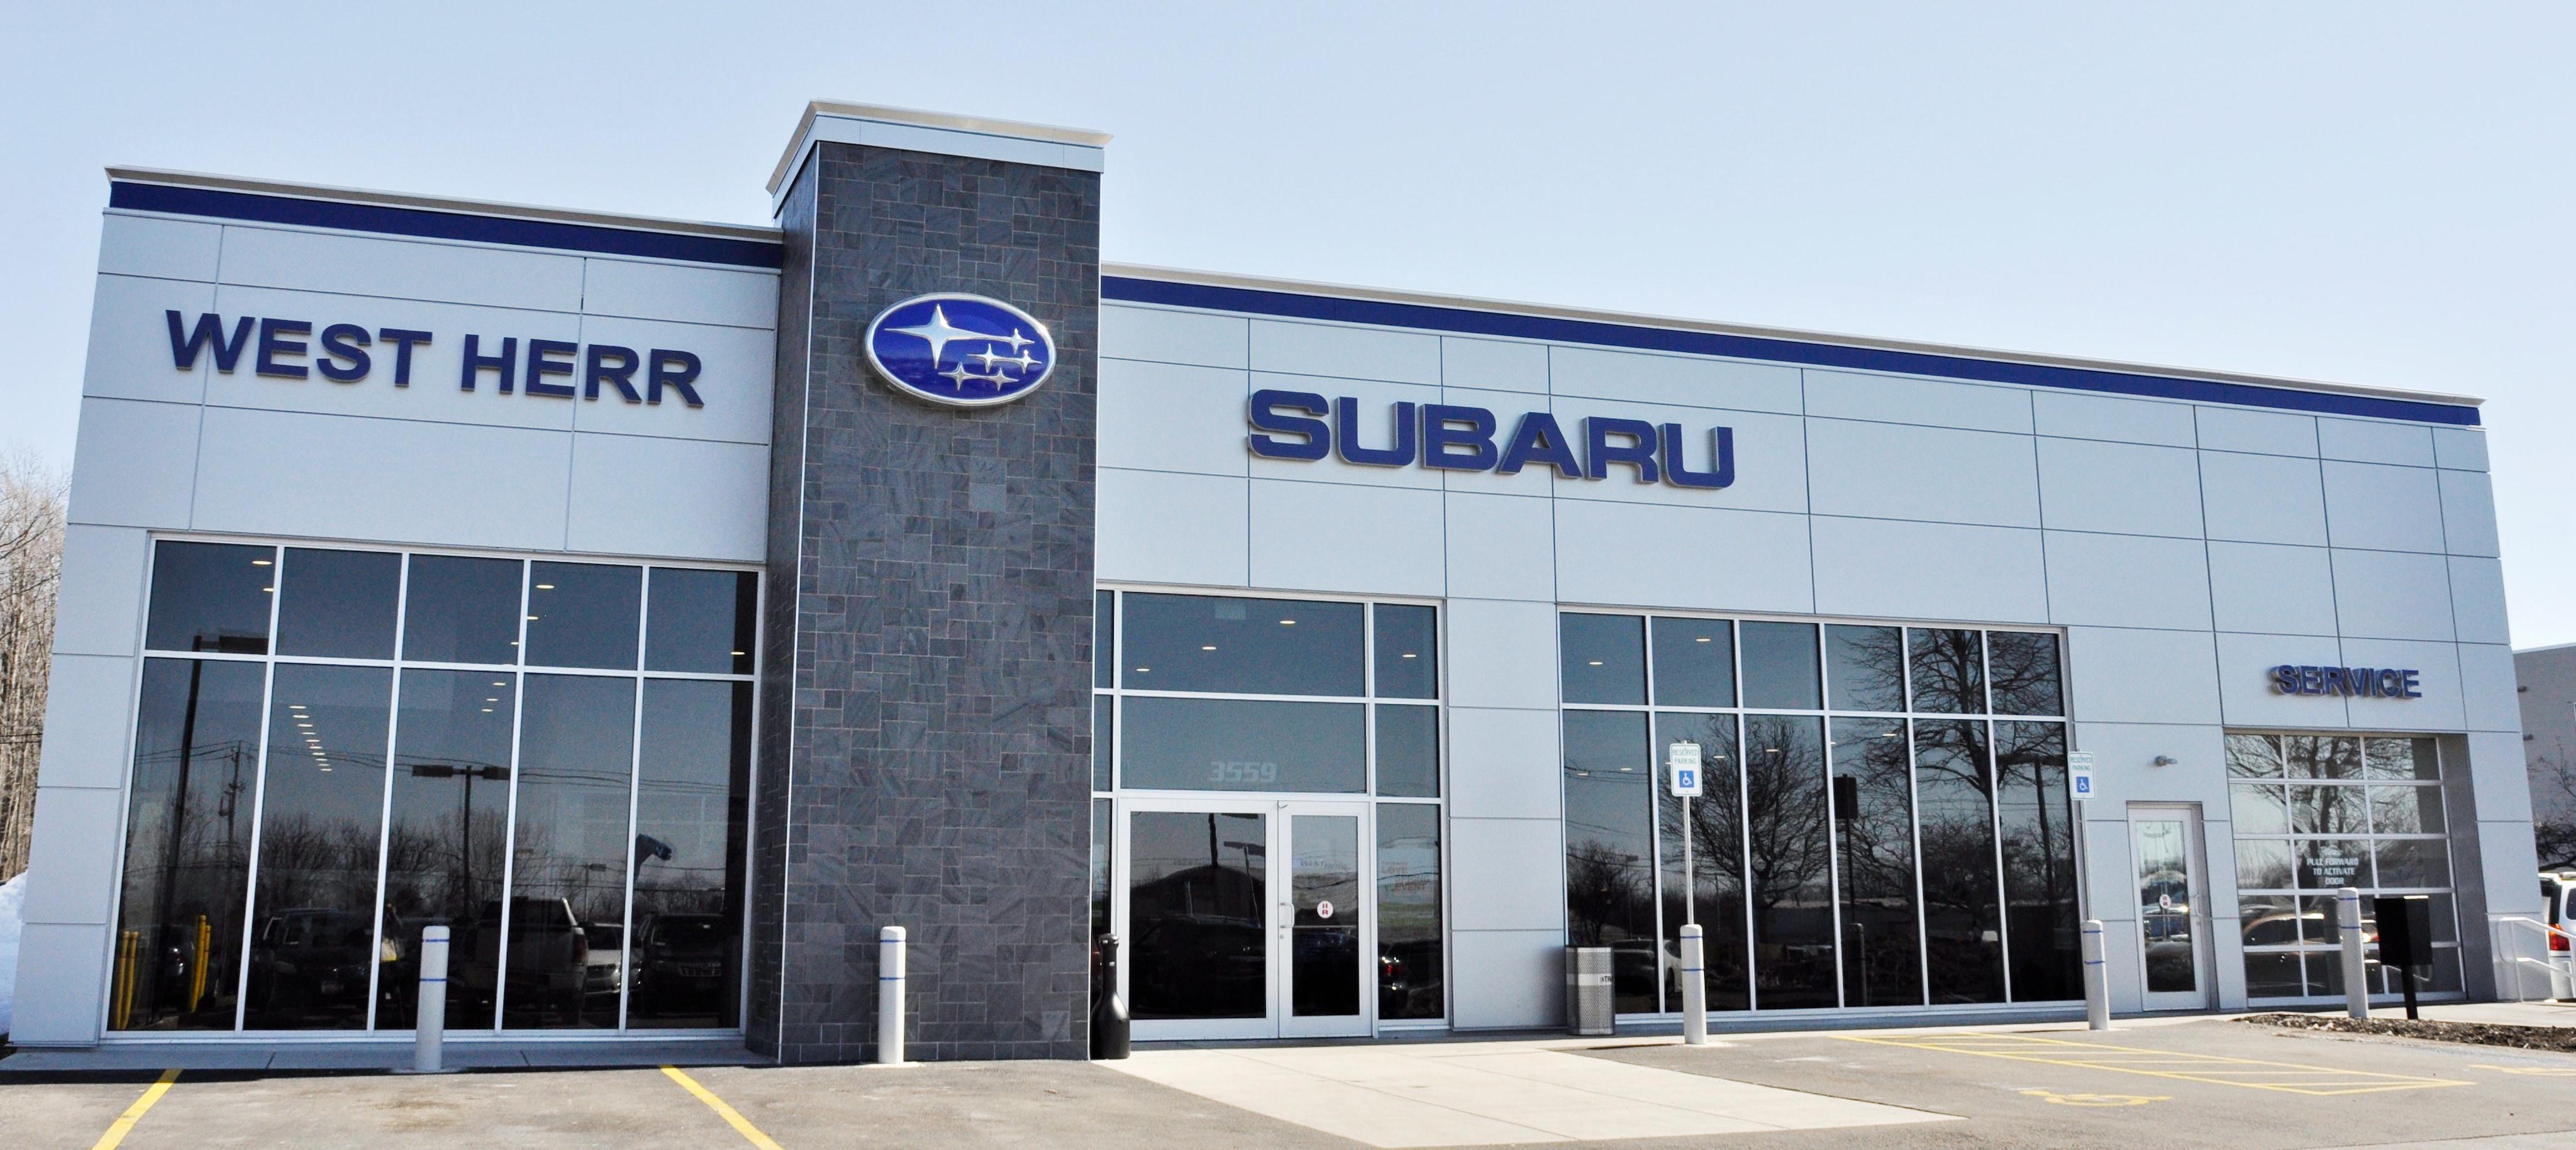 About West Herr Subaru